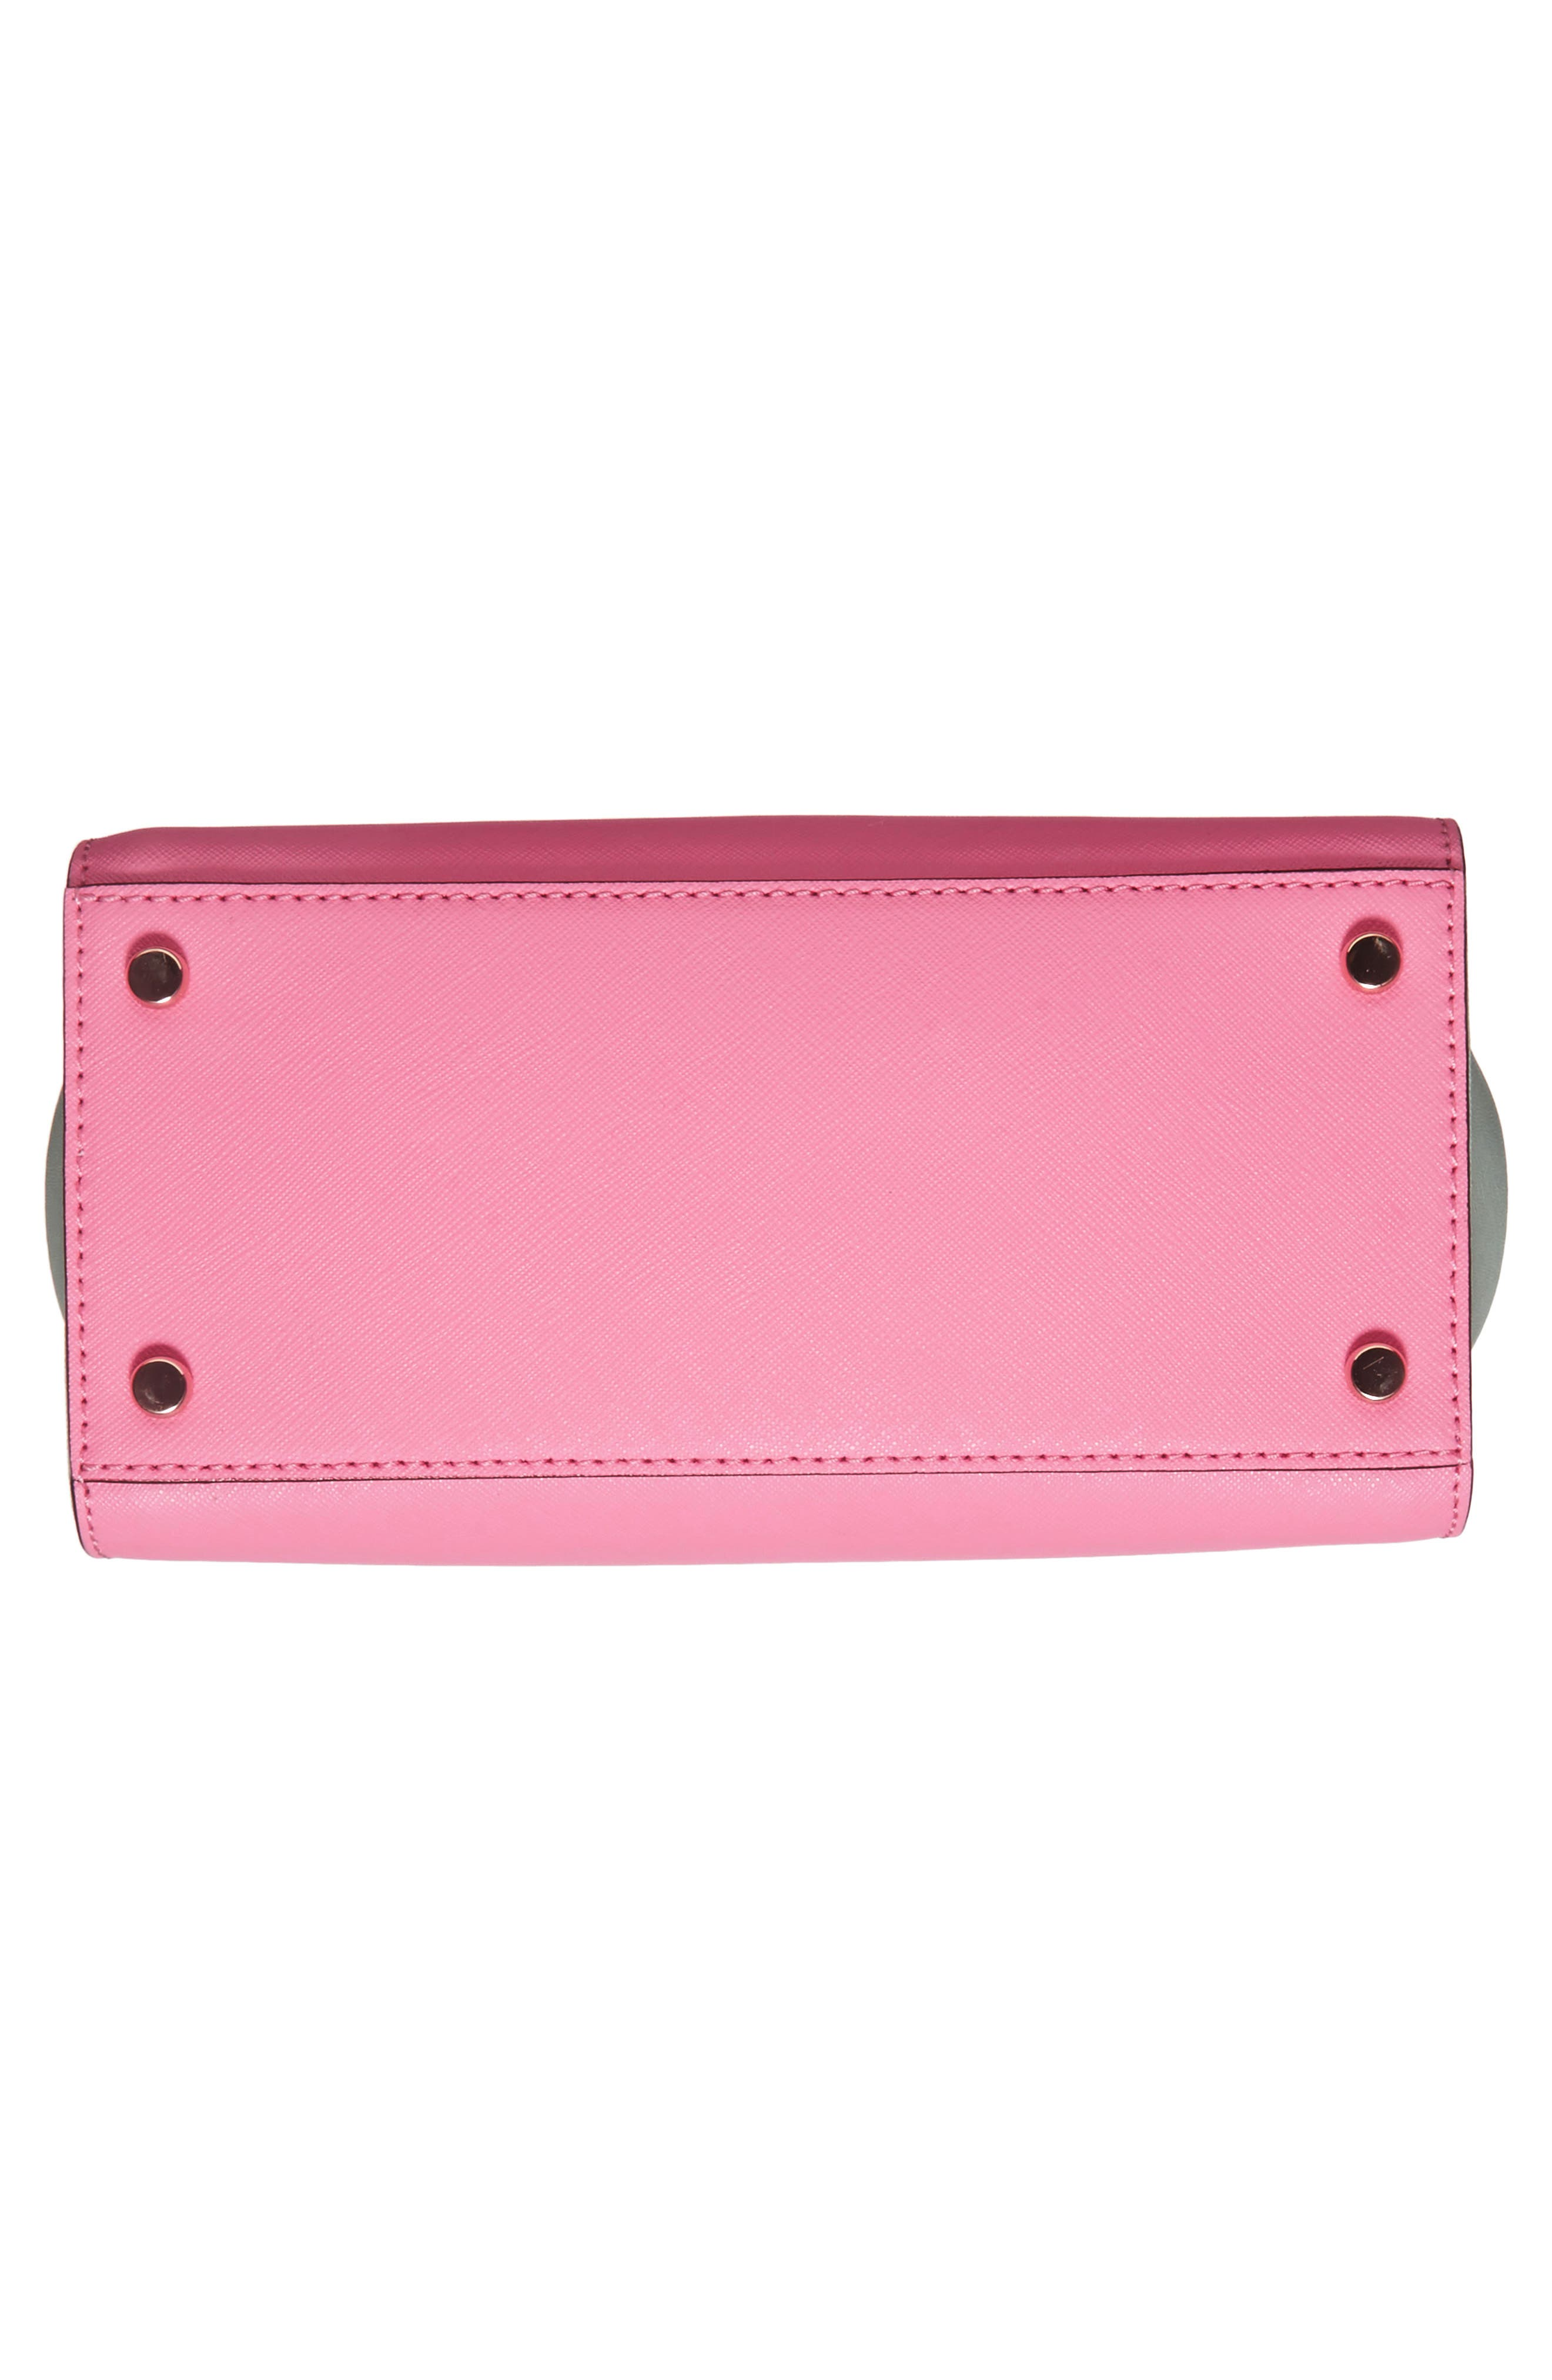 'cameron street - mini candace' leather satchel,                             Alternate thumbnail 6, color,                             690